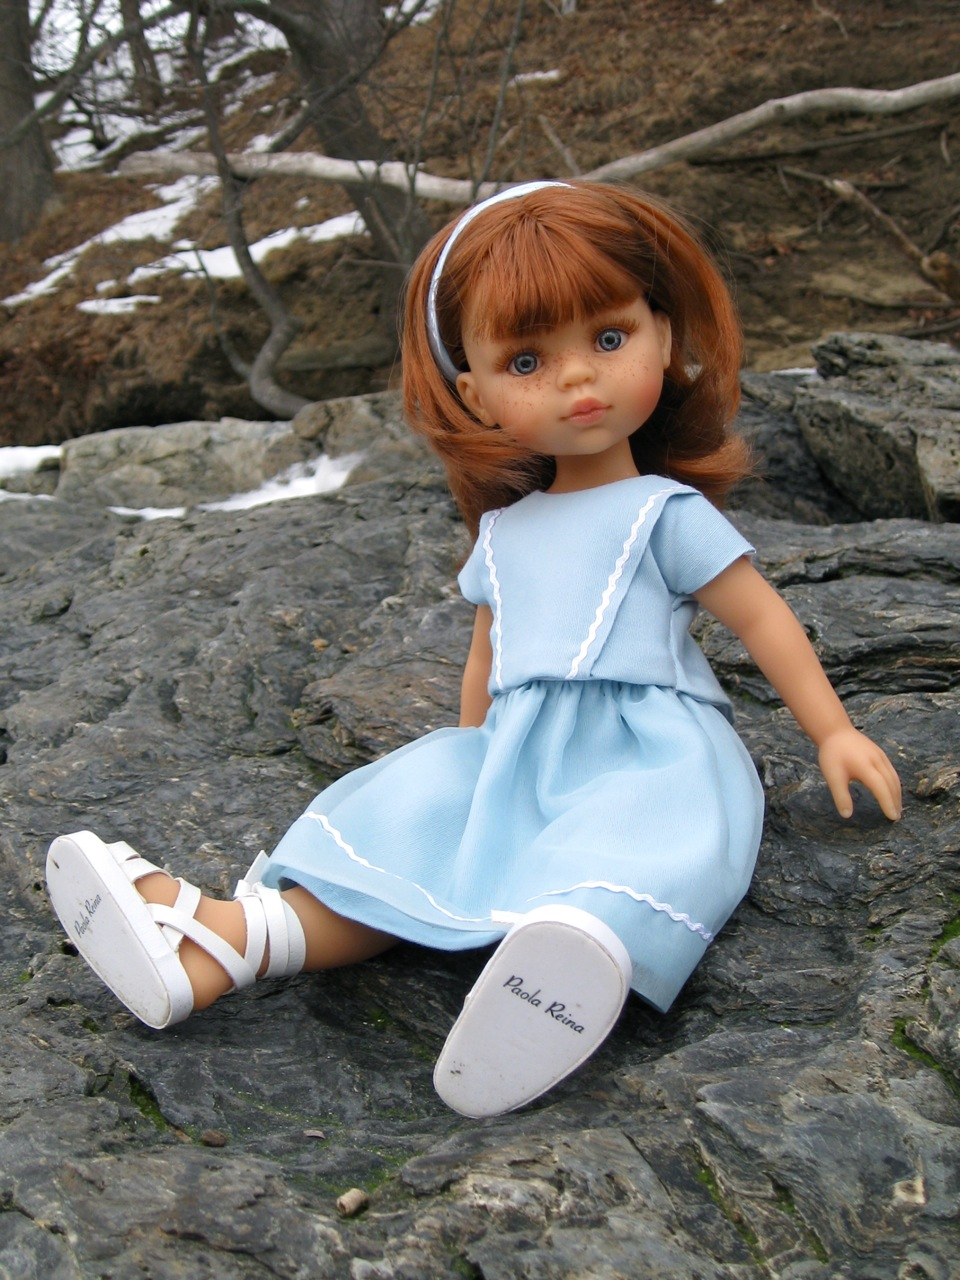 Paola Reina Las Amigas doll, Carla